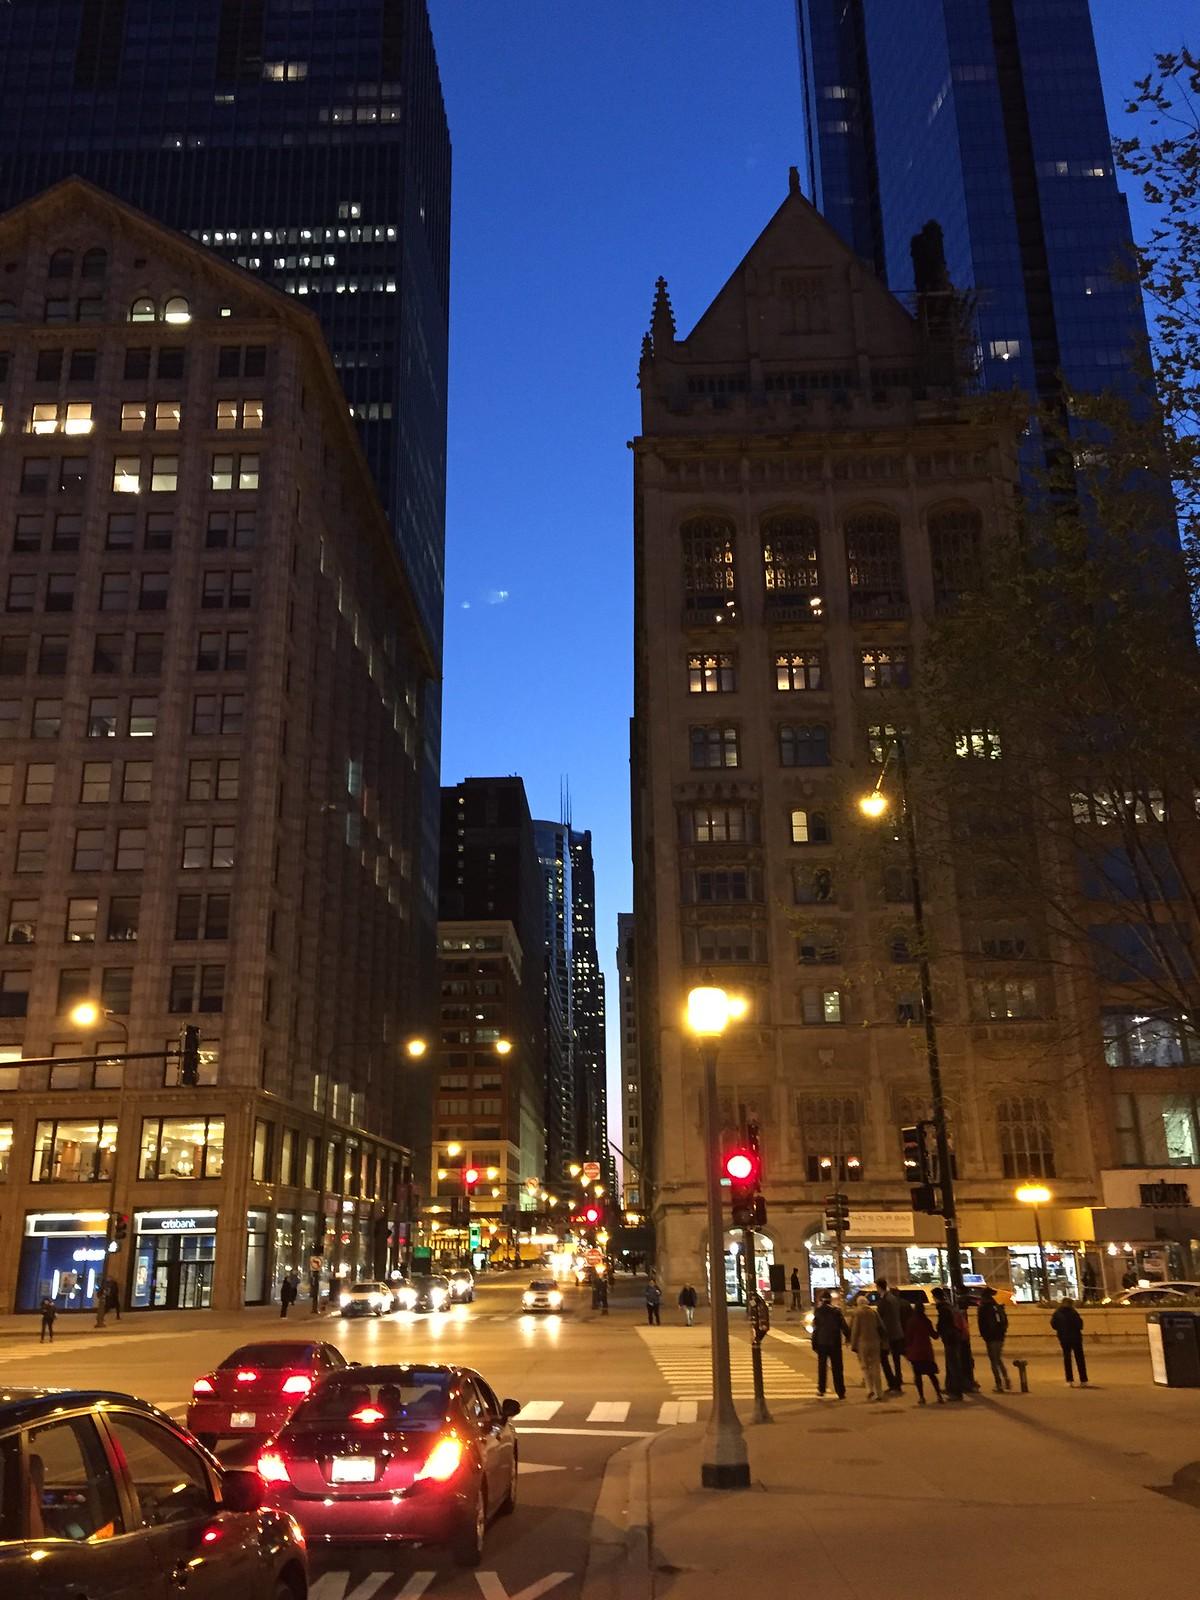 Chicago 23-04-2015 20-04-28